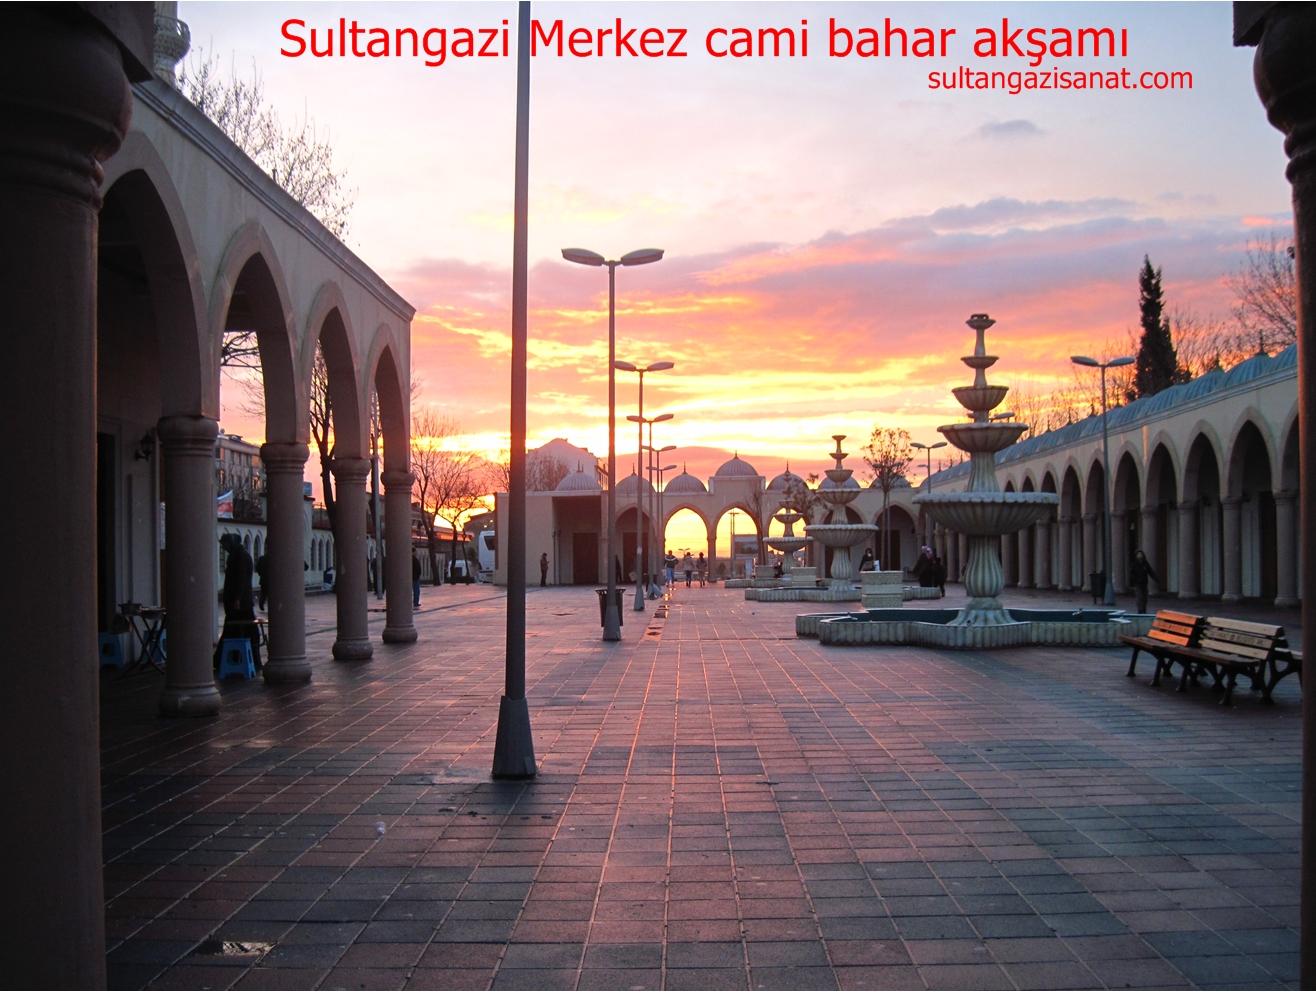 Sultangazi Merkez cami bahar akşamı1